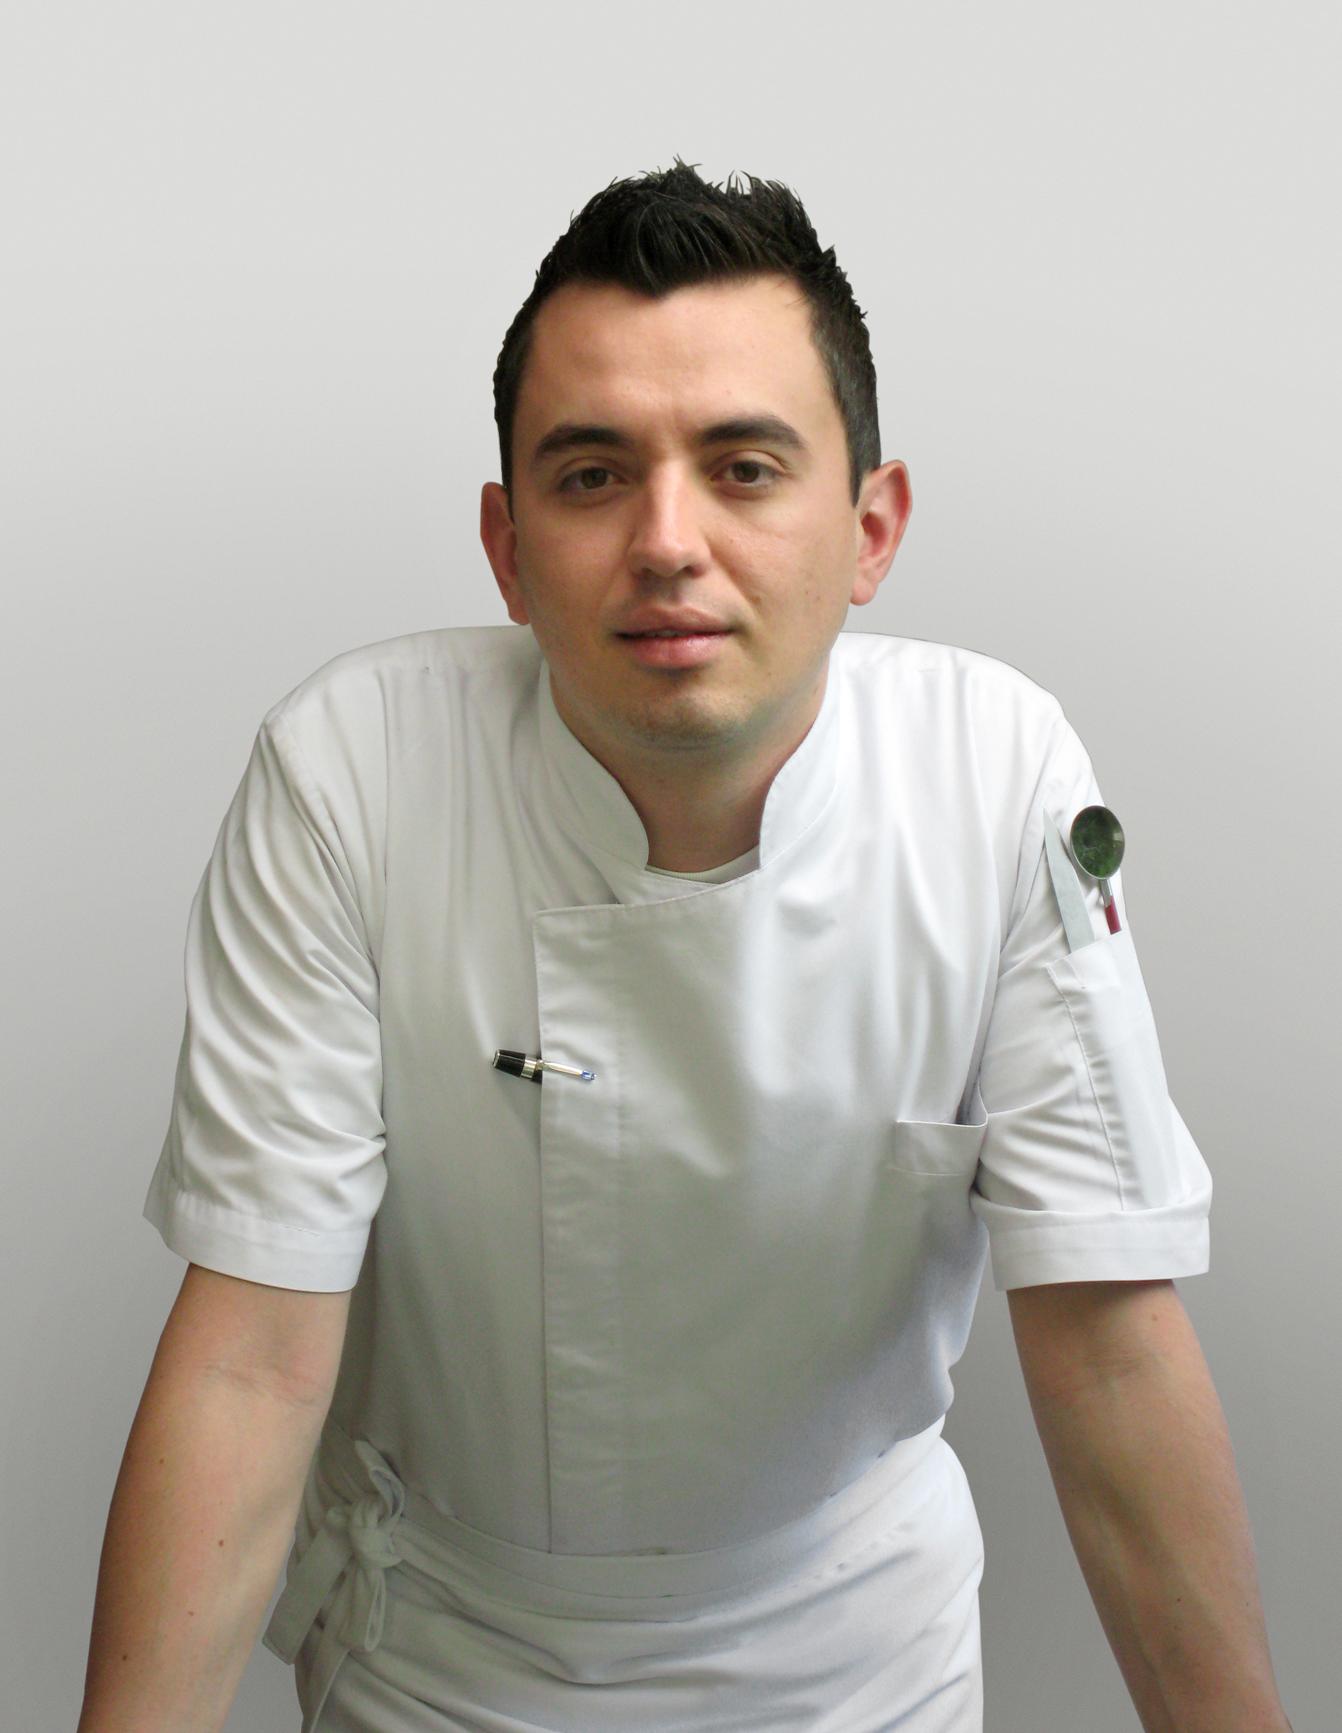 Chef Edgar Nuñez